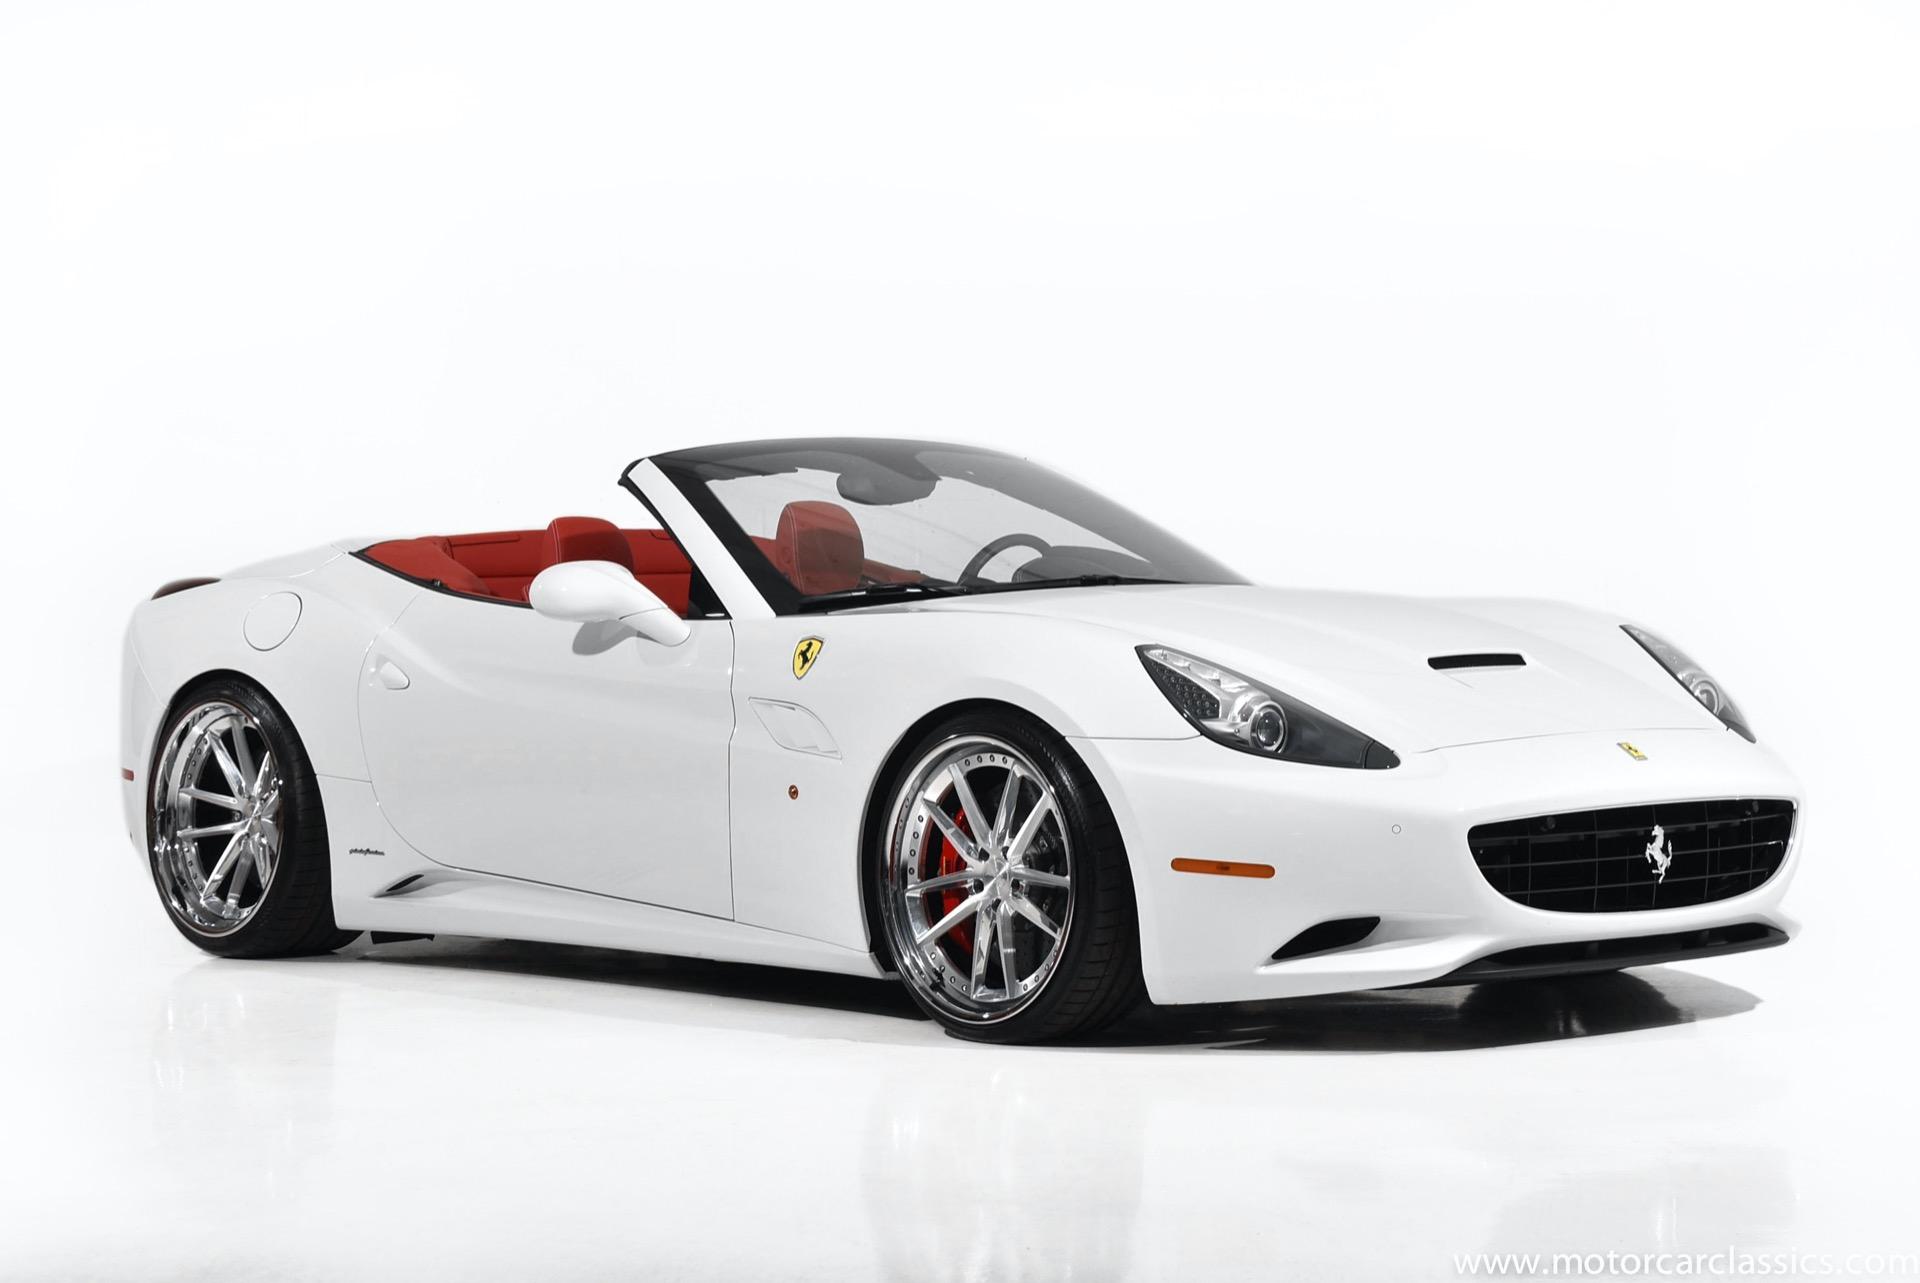 Used 2010 Ferrari California For Sale 98 900 Motorcar Classics Stock 1626